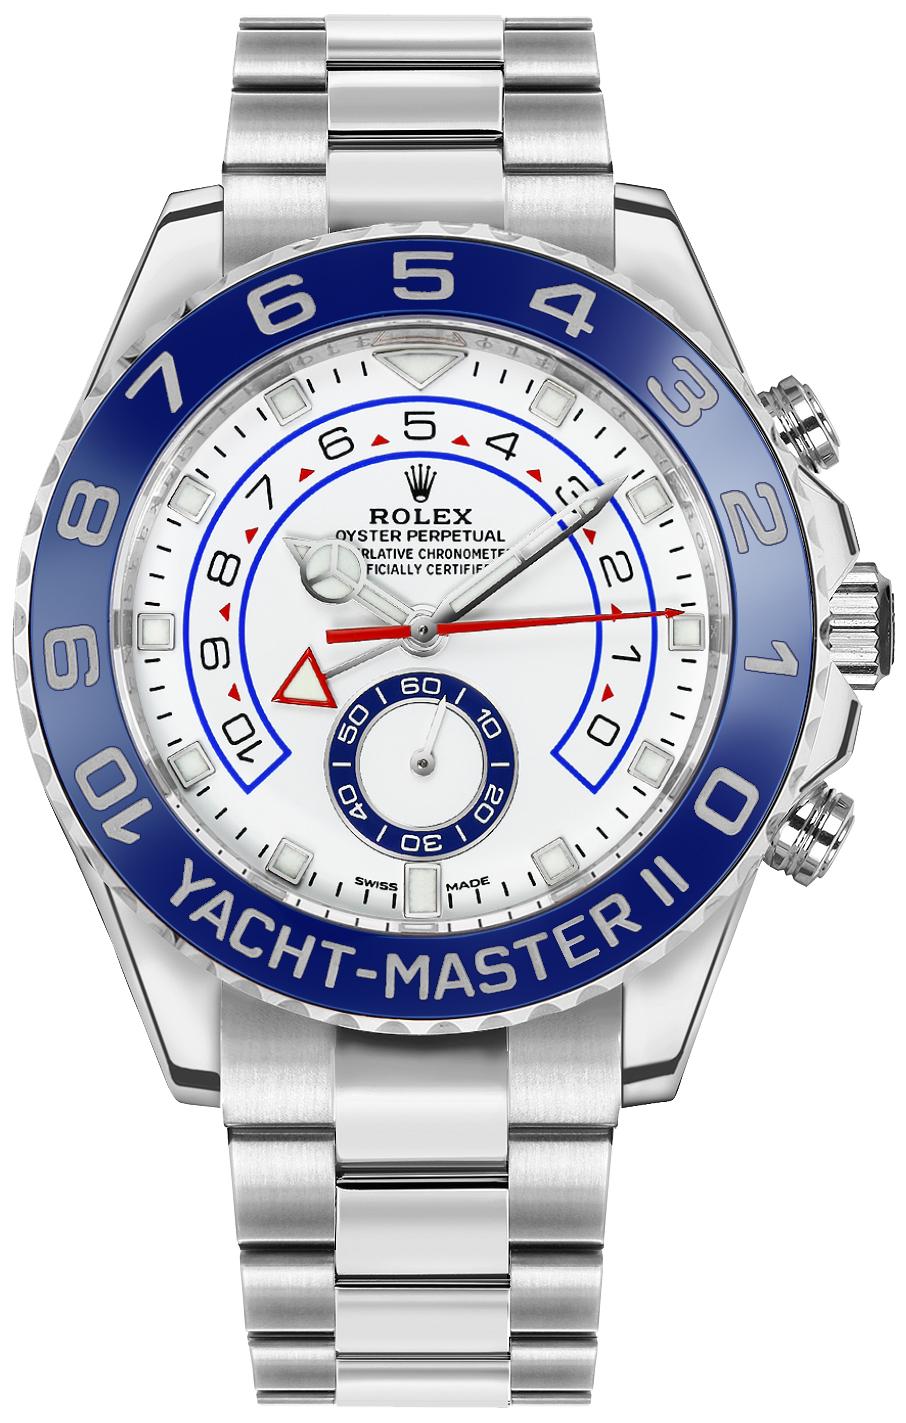 Rolex Yacht-Master II Men's Luxury Watch 116680